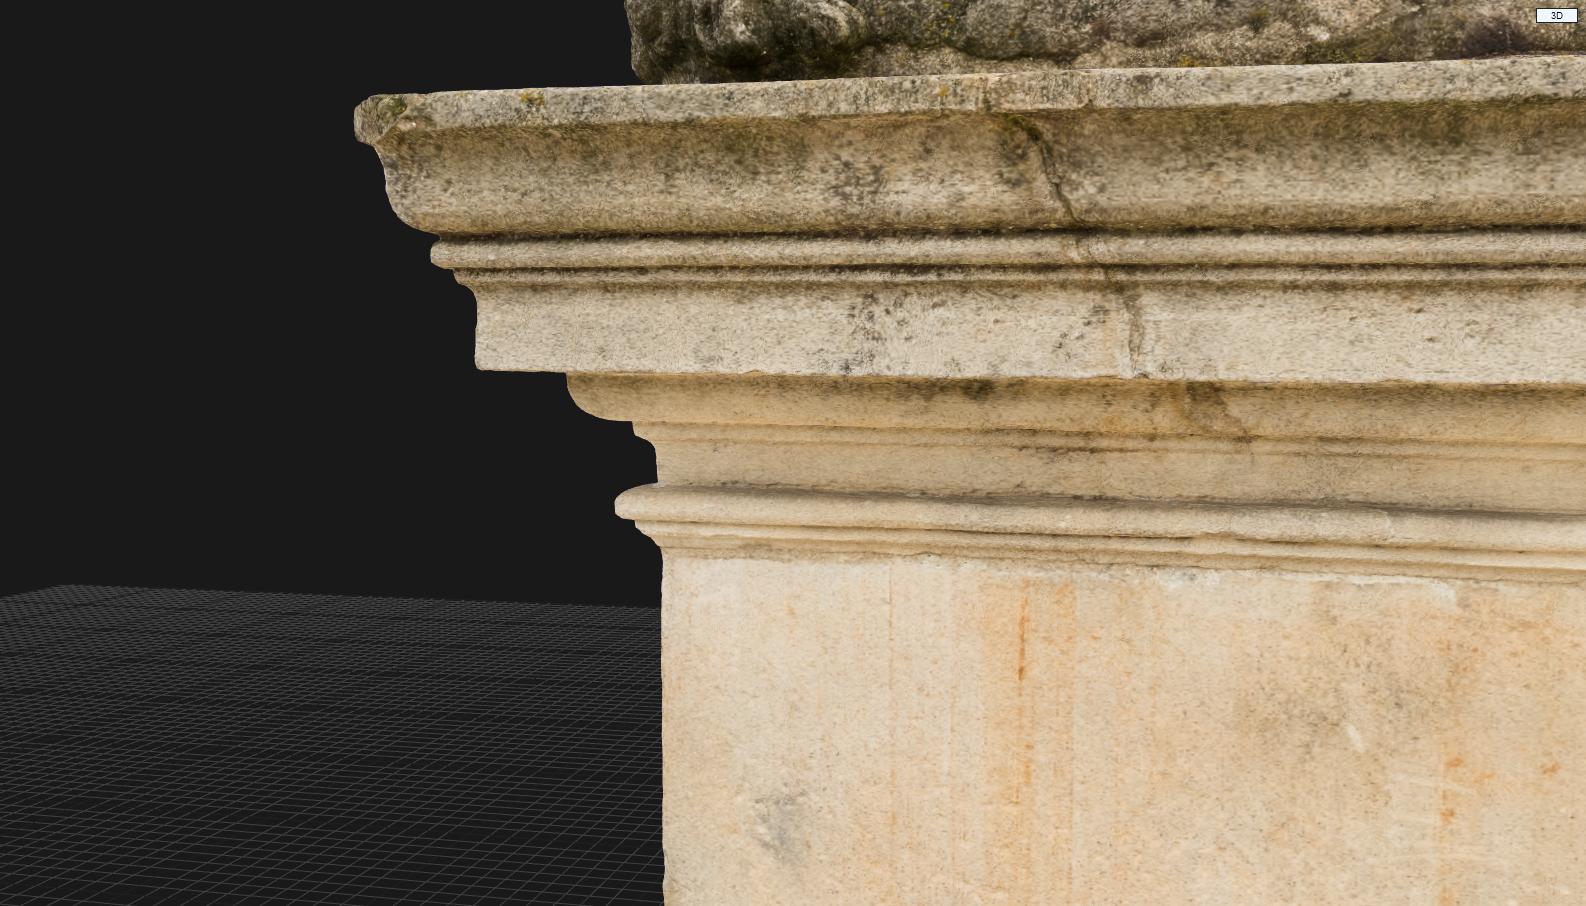 Cultural Heritage - 3D Scan by Paul Safko - Screenshot